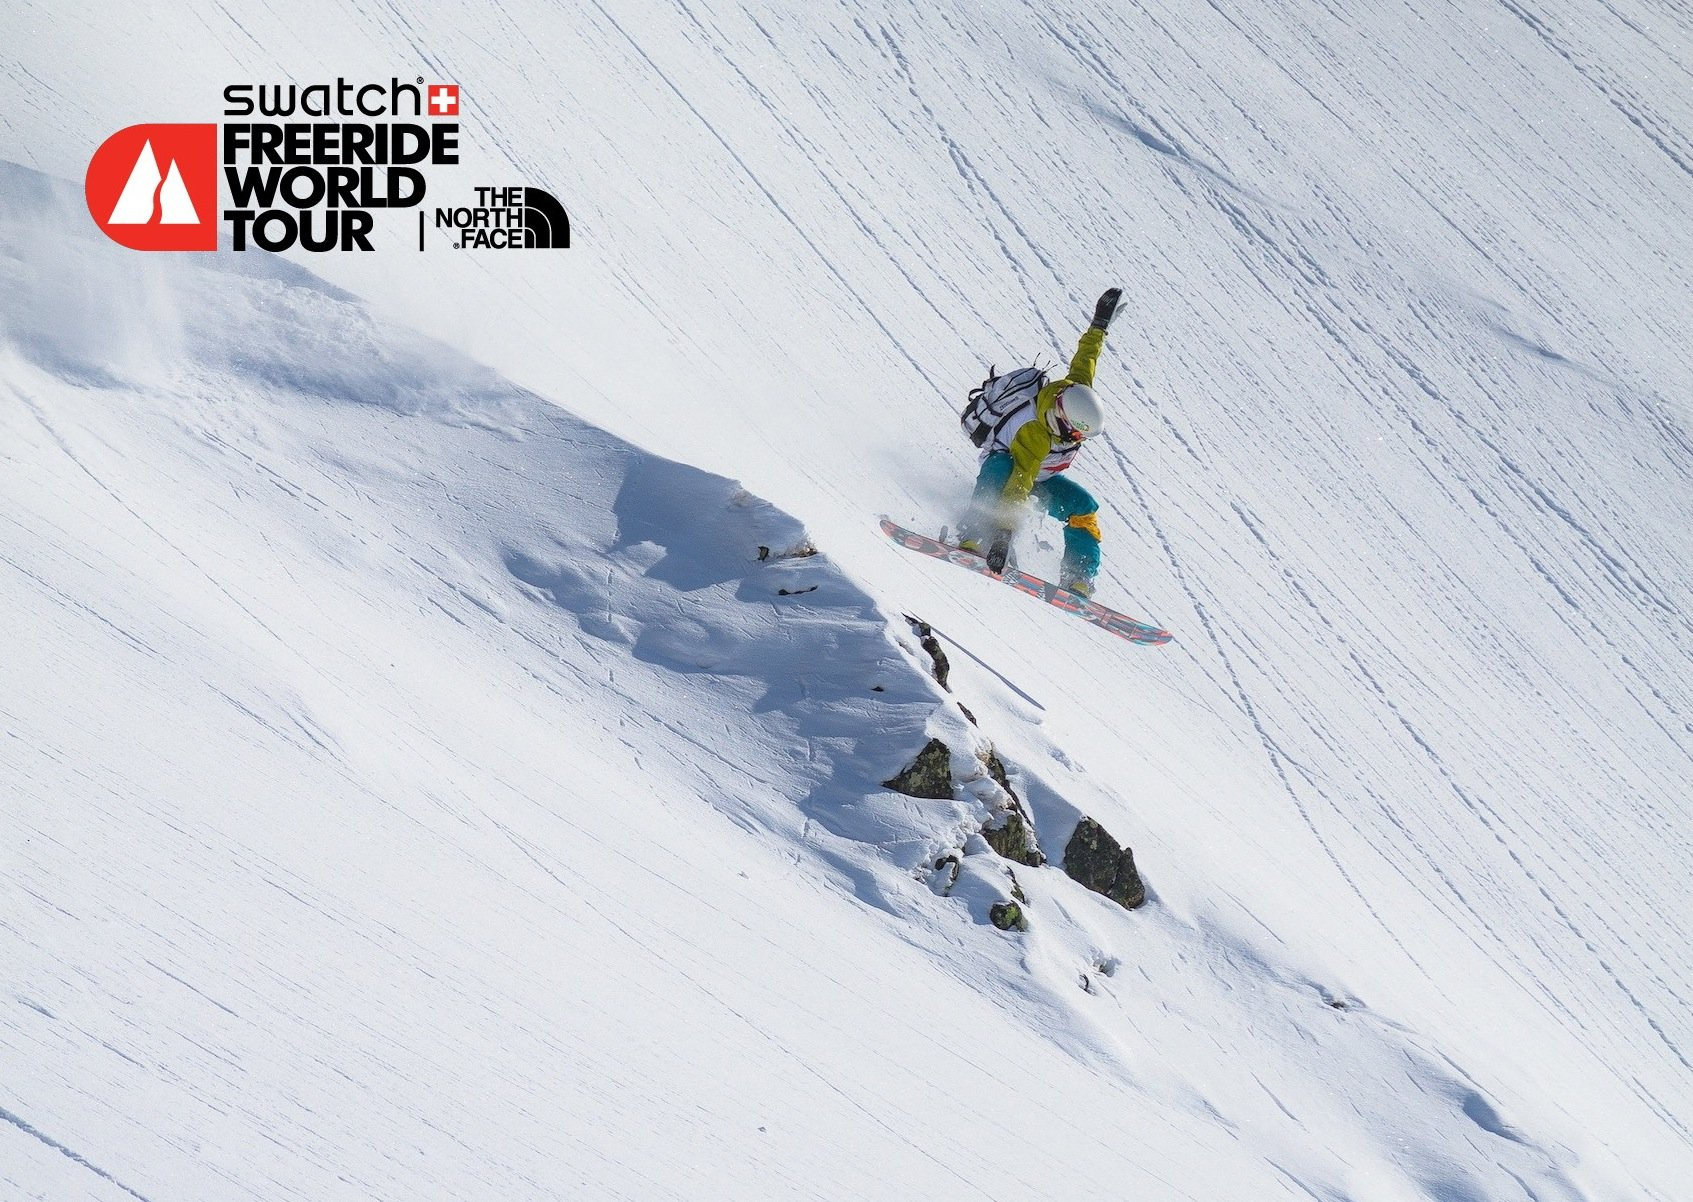 Event – Swatch Freeride Tour 2015 by The North Face®: Internationale Freeride-Szene trifft sich wieder in Fieberbrunn (Kitzbühler Alpen)